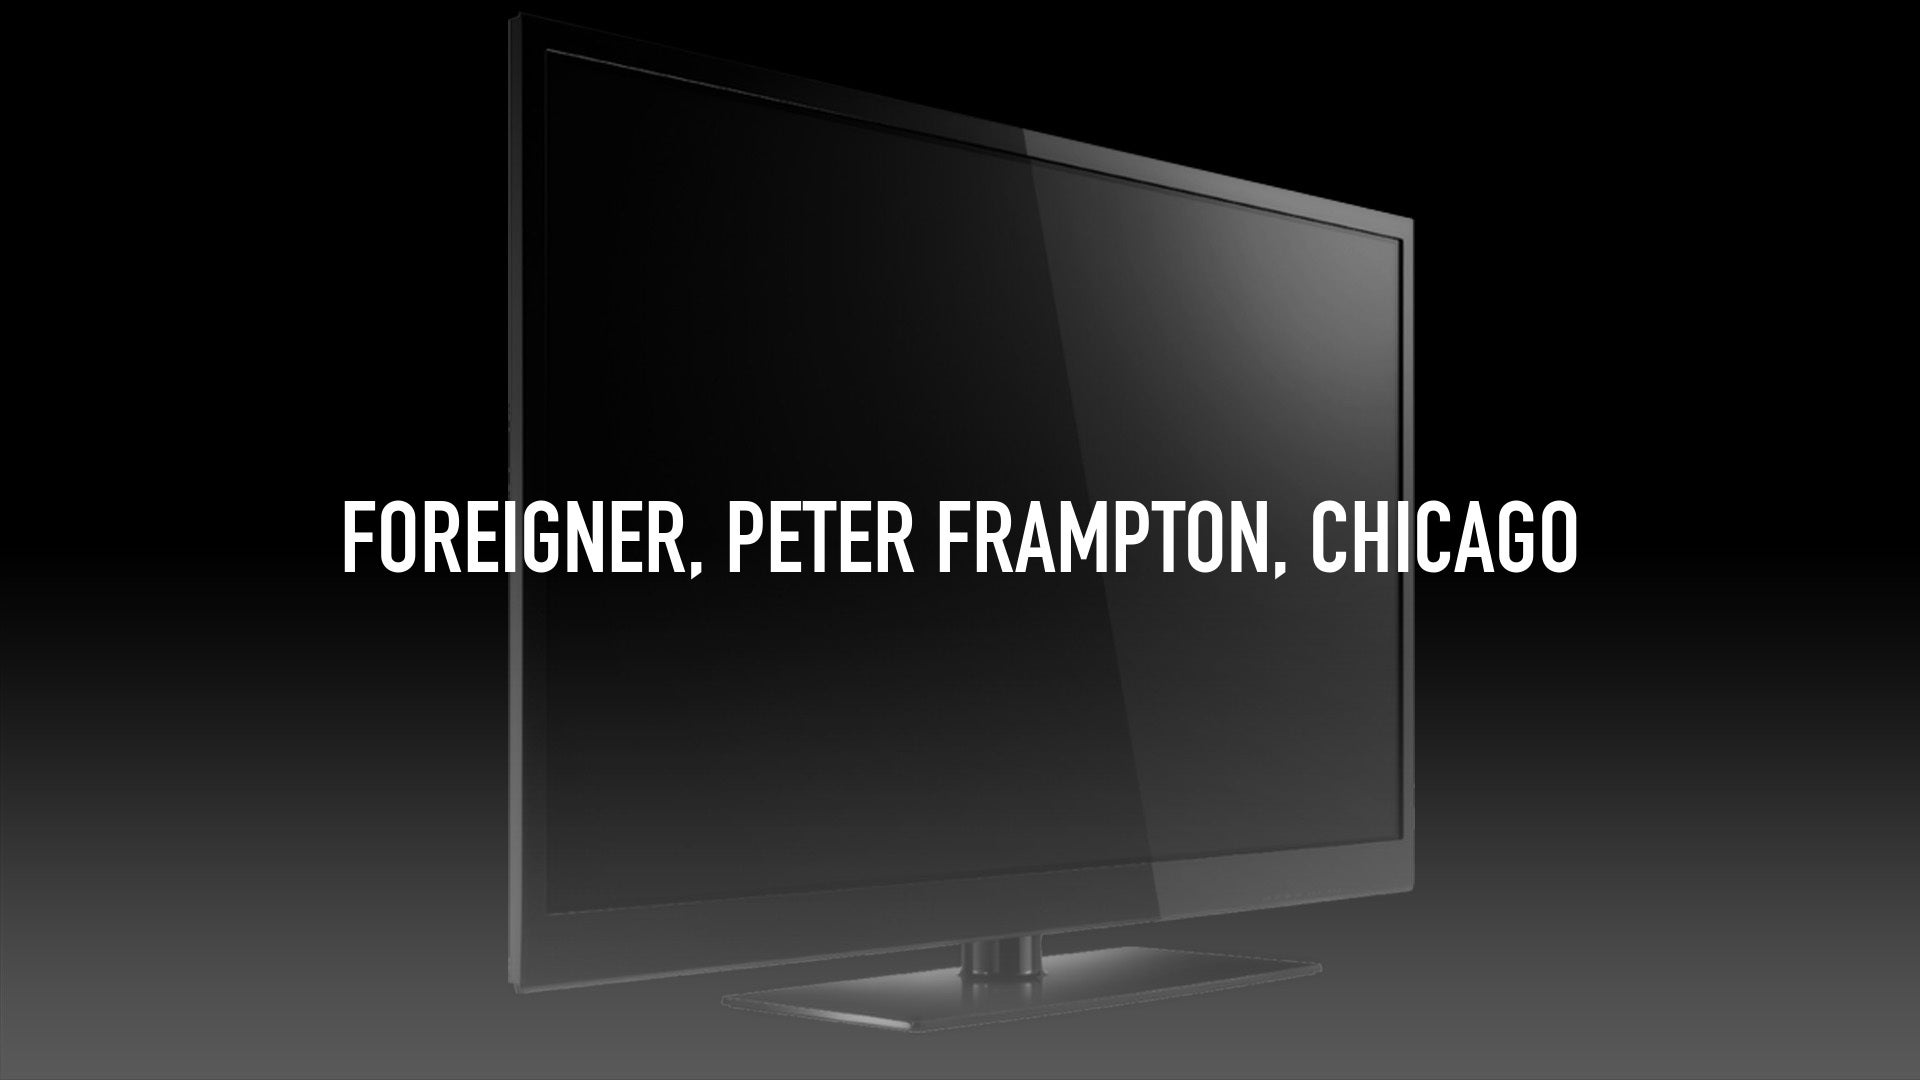 Foreigner, Peter Frampton, Chicago